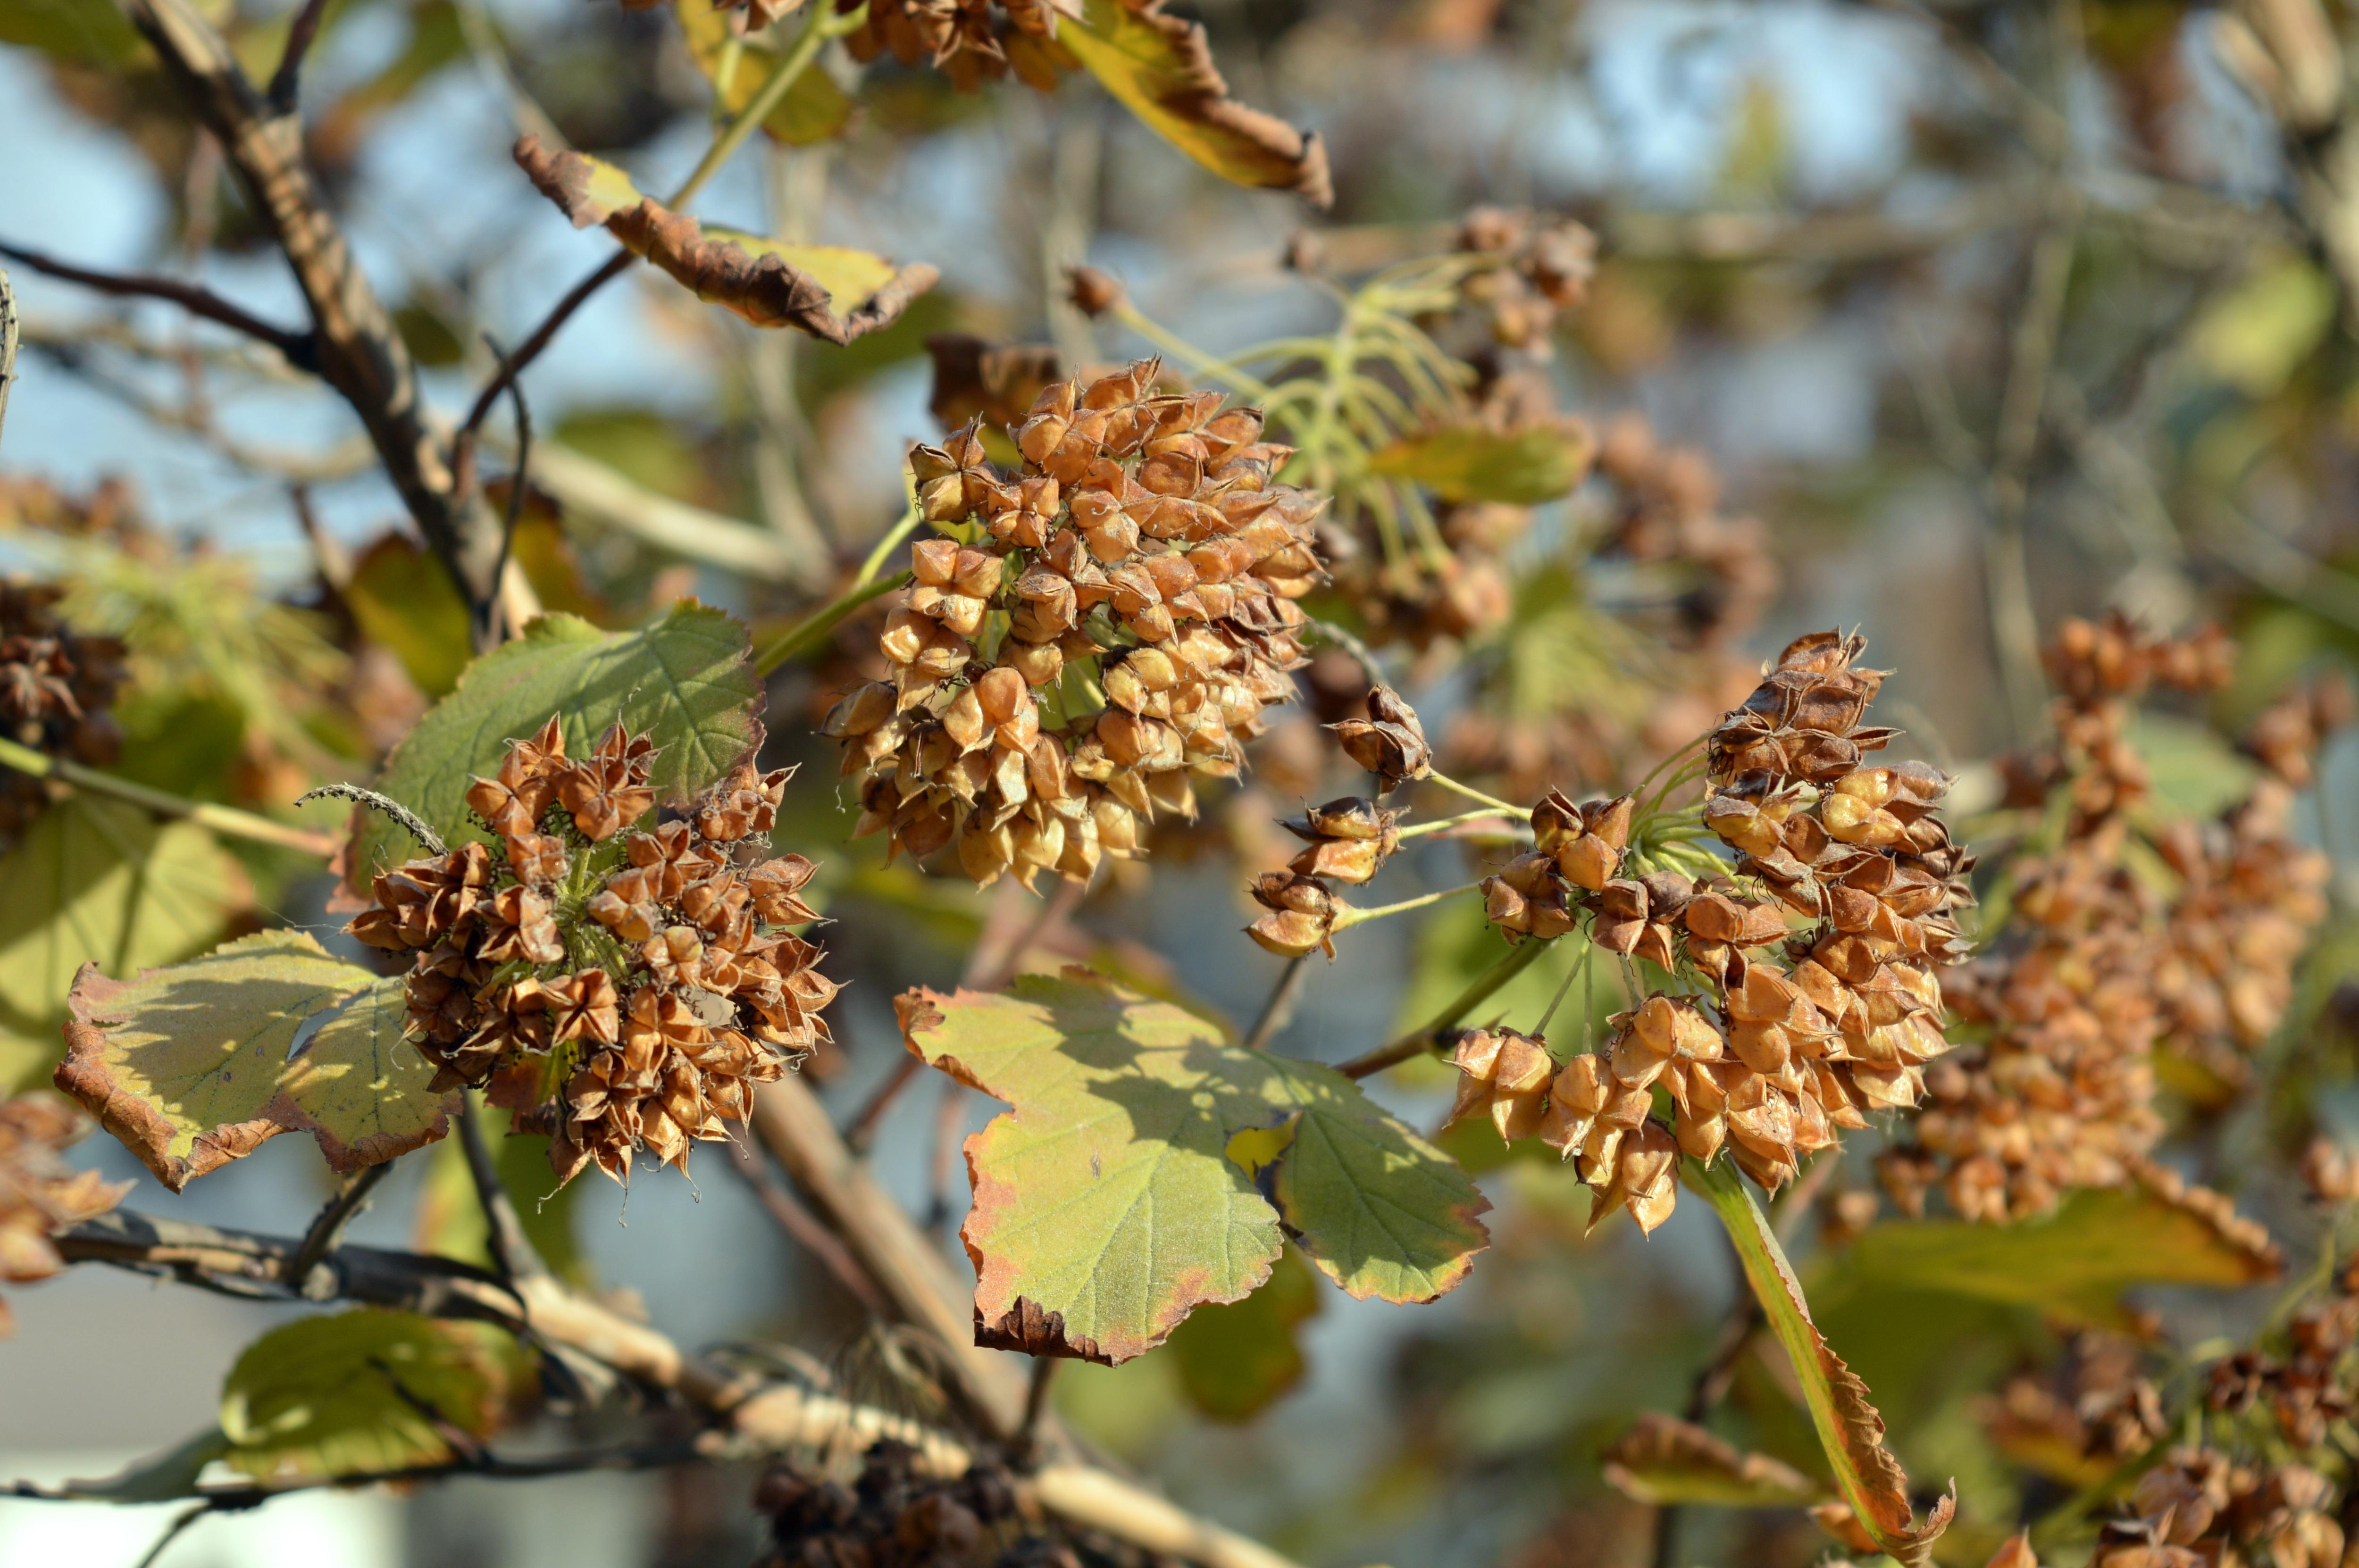 Gambar Pohon Alam Cabang Menanam Buah Daun Bunga Semak Kotak Makan Duo Sunday Green Makanan Hijau Menghasilkan Musim Gugur Botani Taman Flora Fauna Lembar